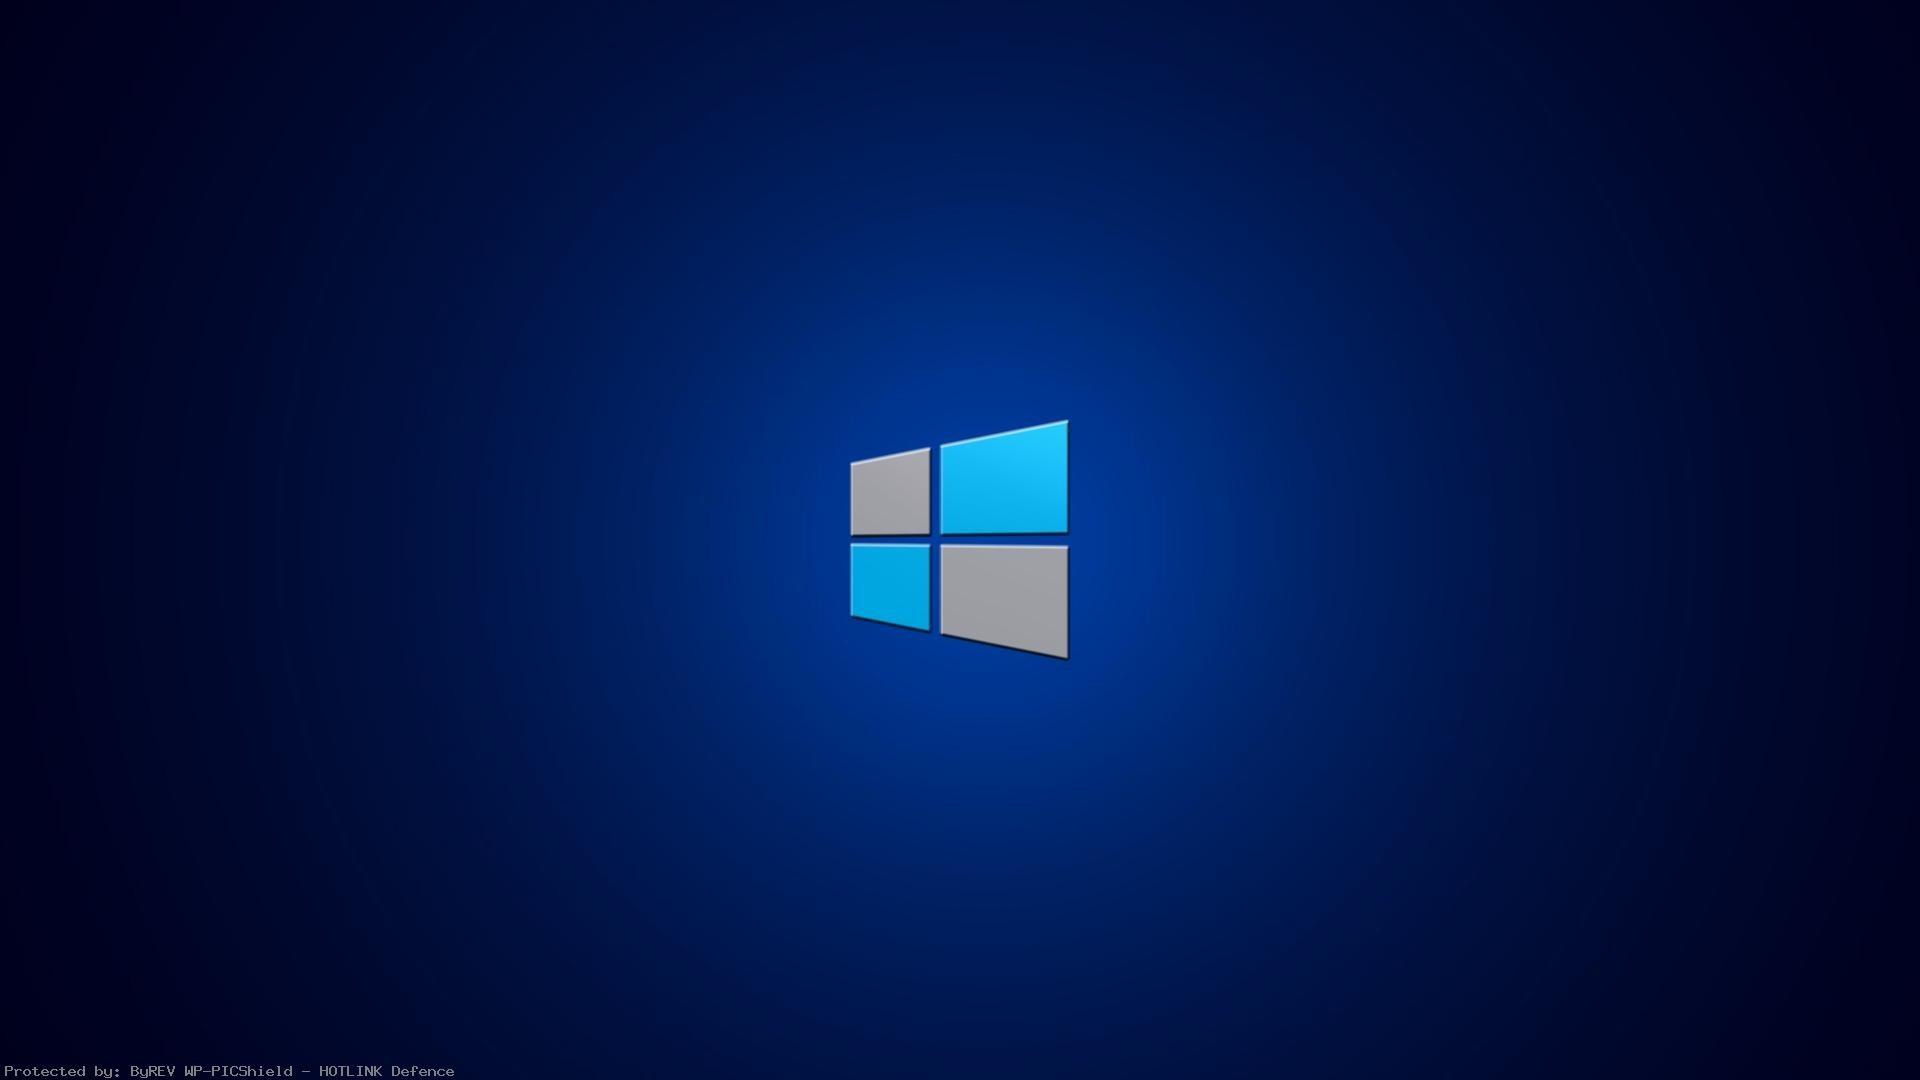 Windows-Minimal-Official-Logo-1080p-HD-1080p-HD-